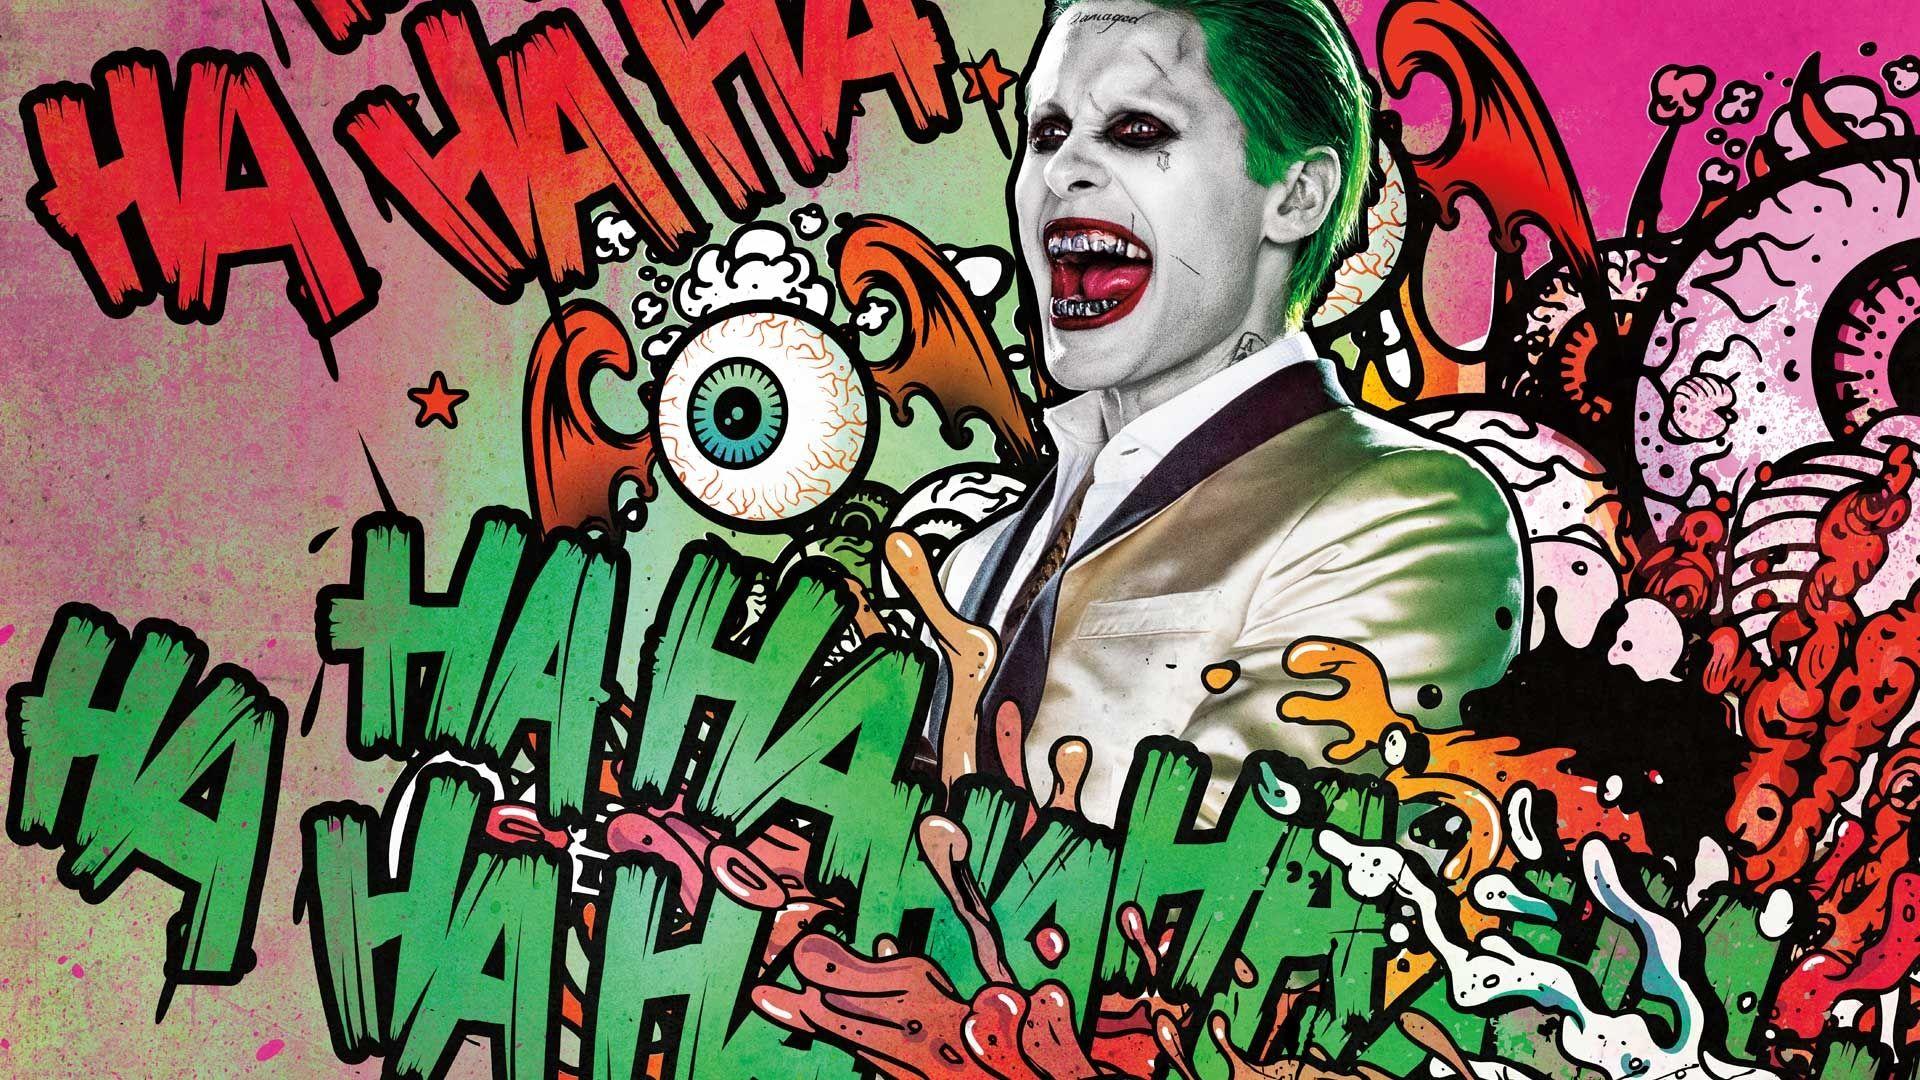 Suicide Squad Joker, Wallpaper Image